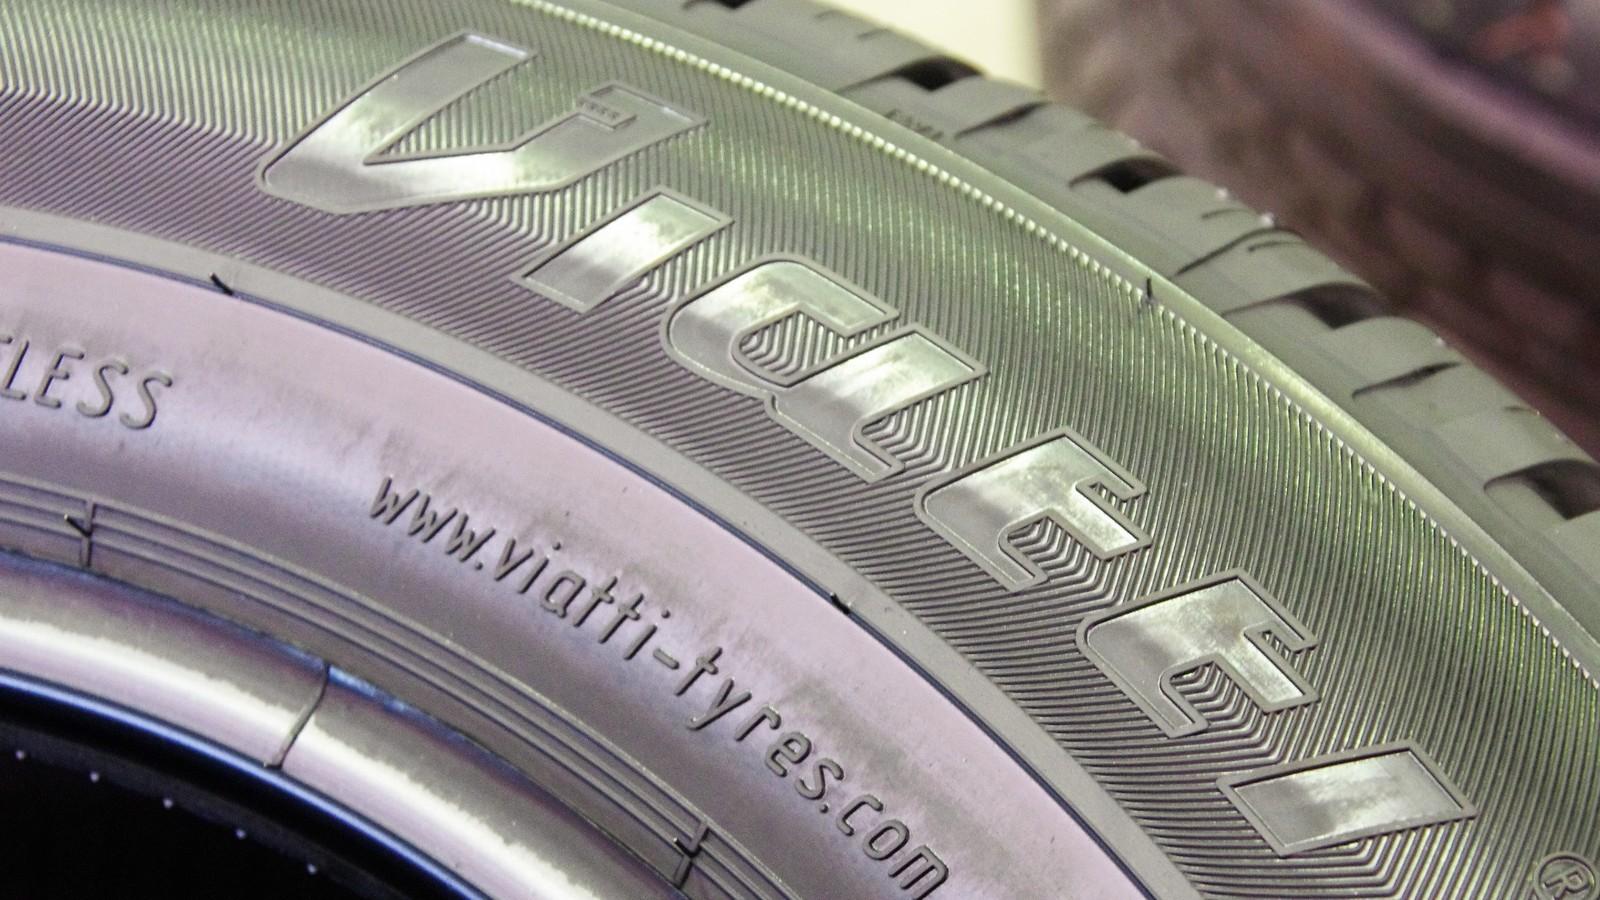 Маркировка шины размера 215/55 R17 94V V-130